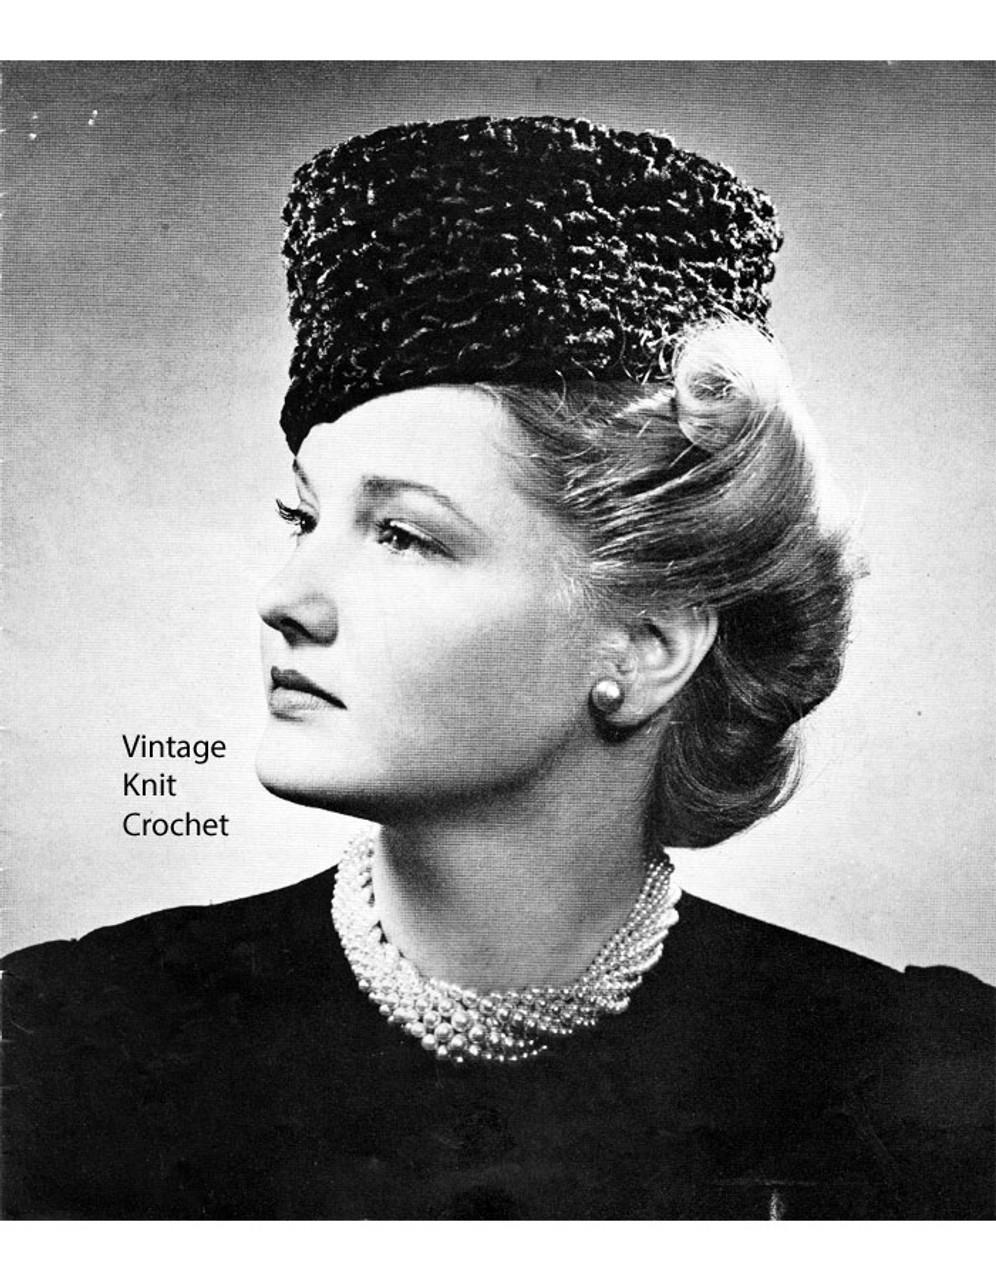 Vintage Fez Knitting Pattern, 1939